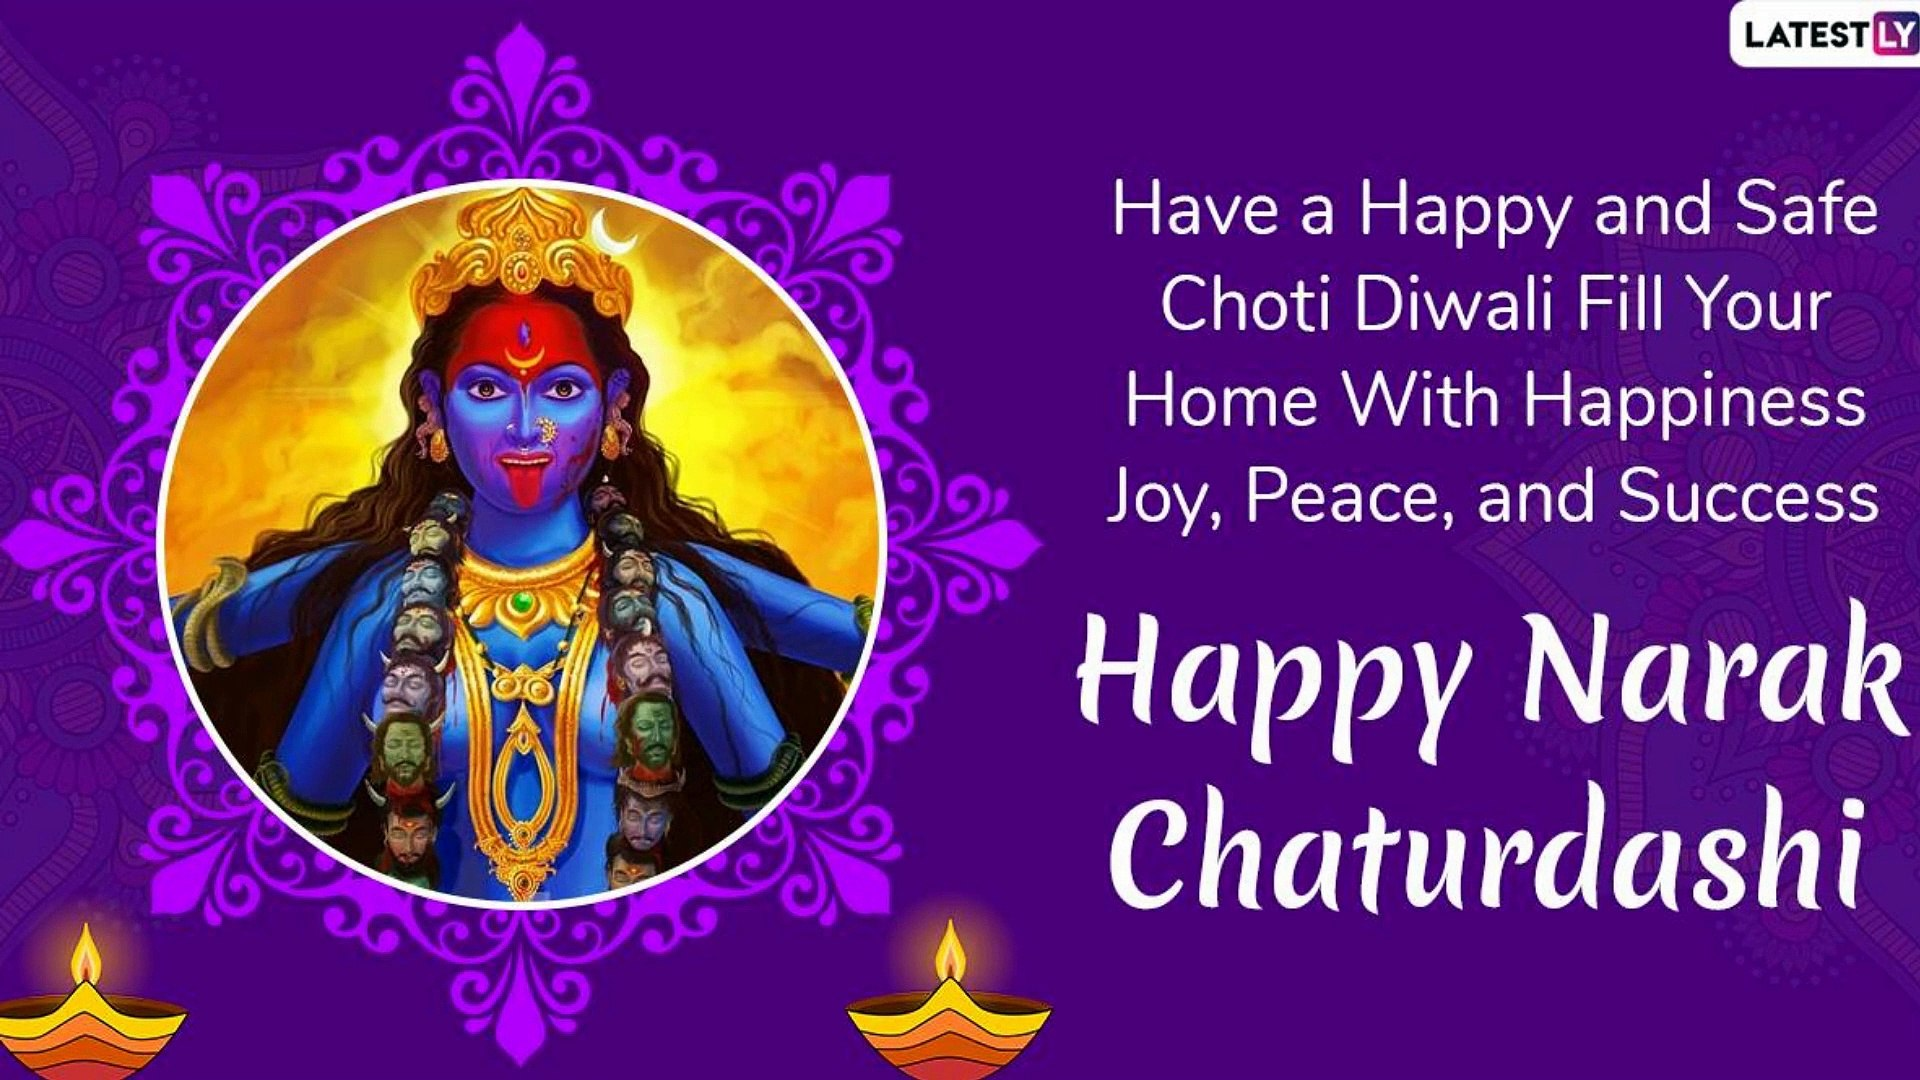 Naraka Chaturdashi Wishes thumbnail